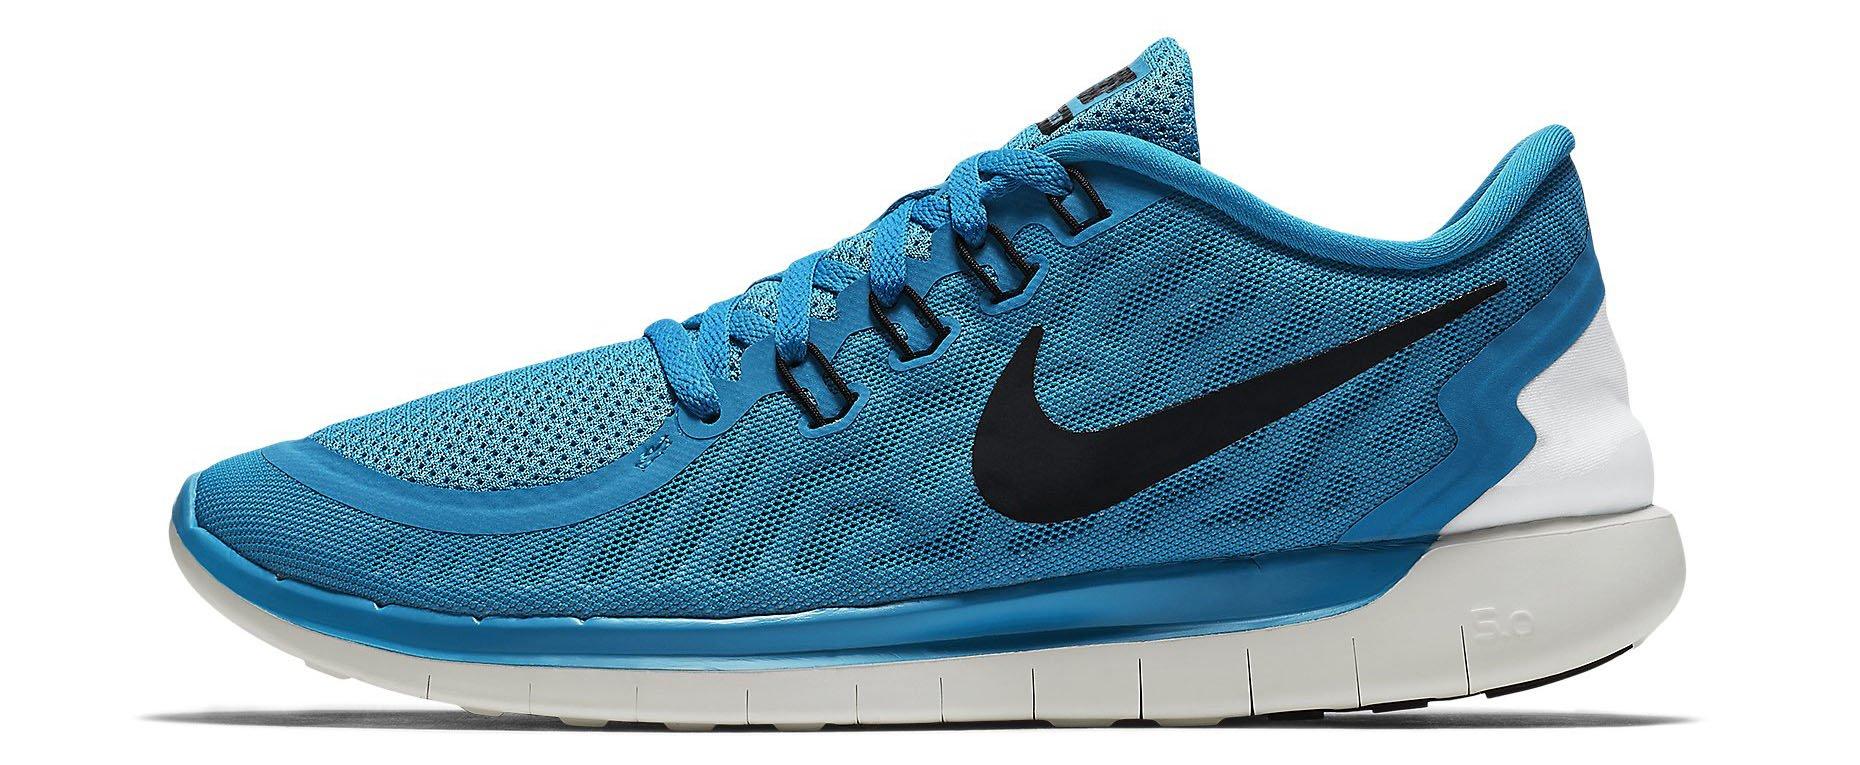 Běžecká obuv Nike FREE 5.0